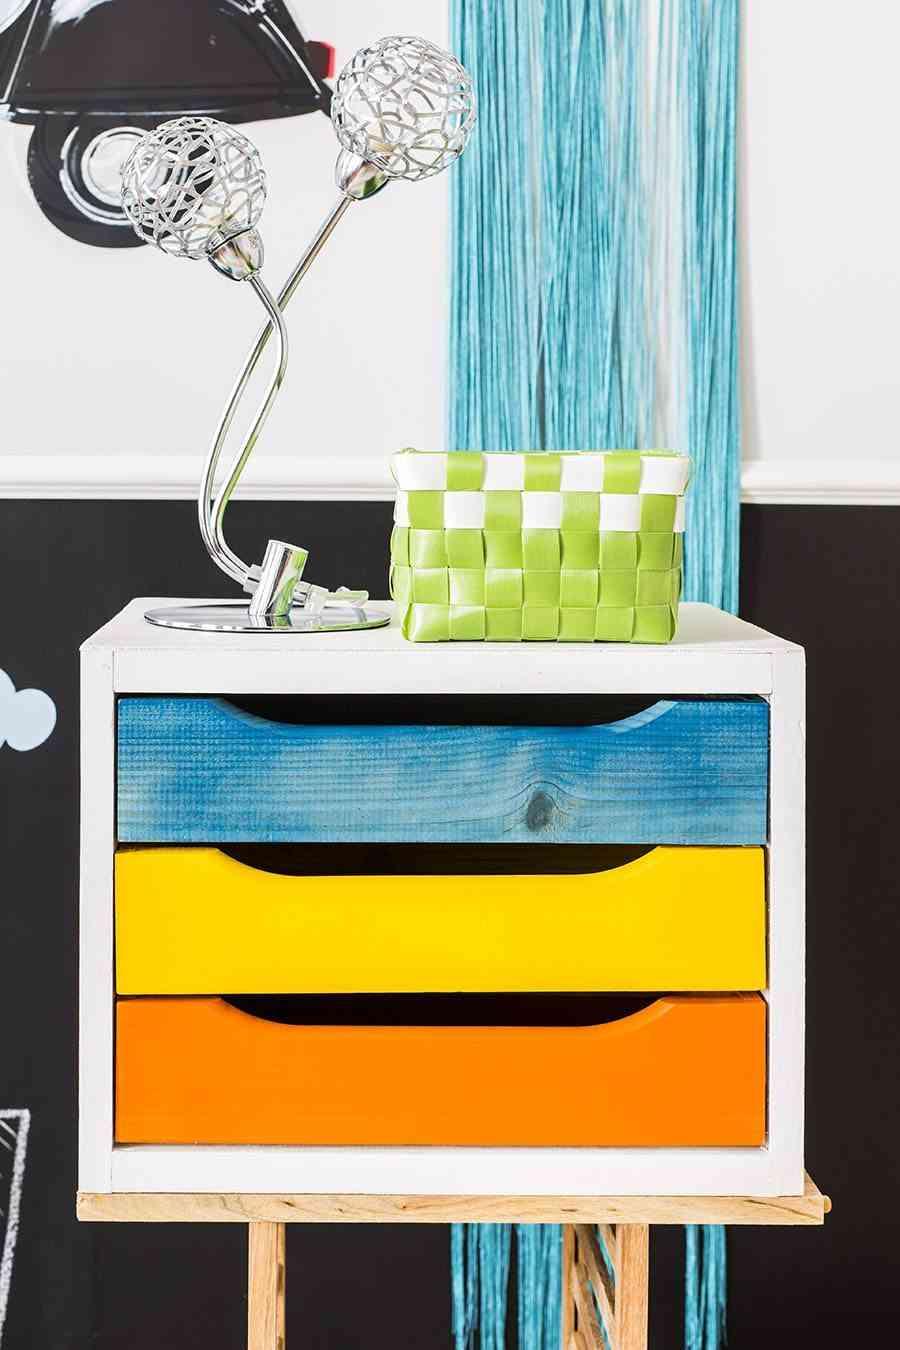 C mo pintar una cajonera de madera paso a paso for Pegatinas para decorar muebles